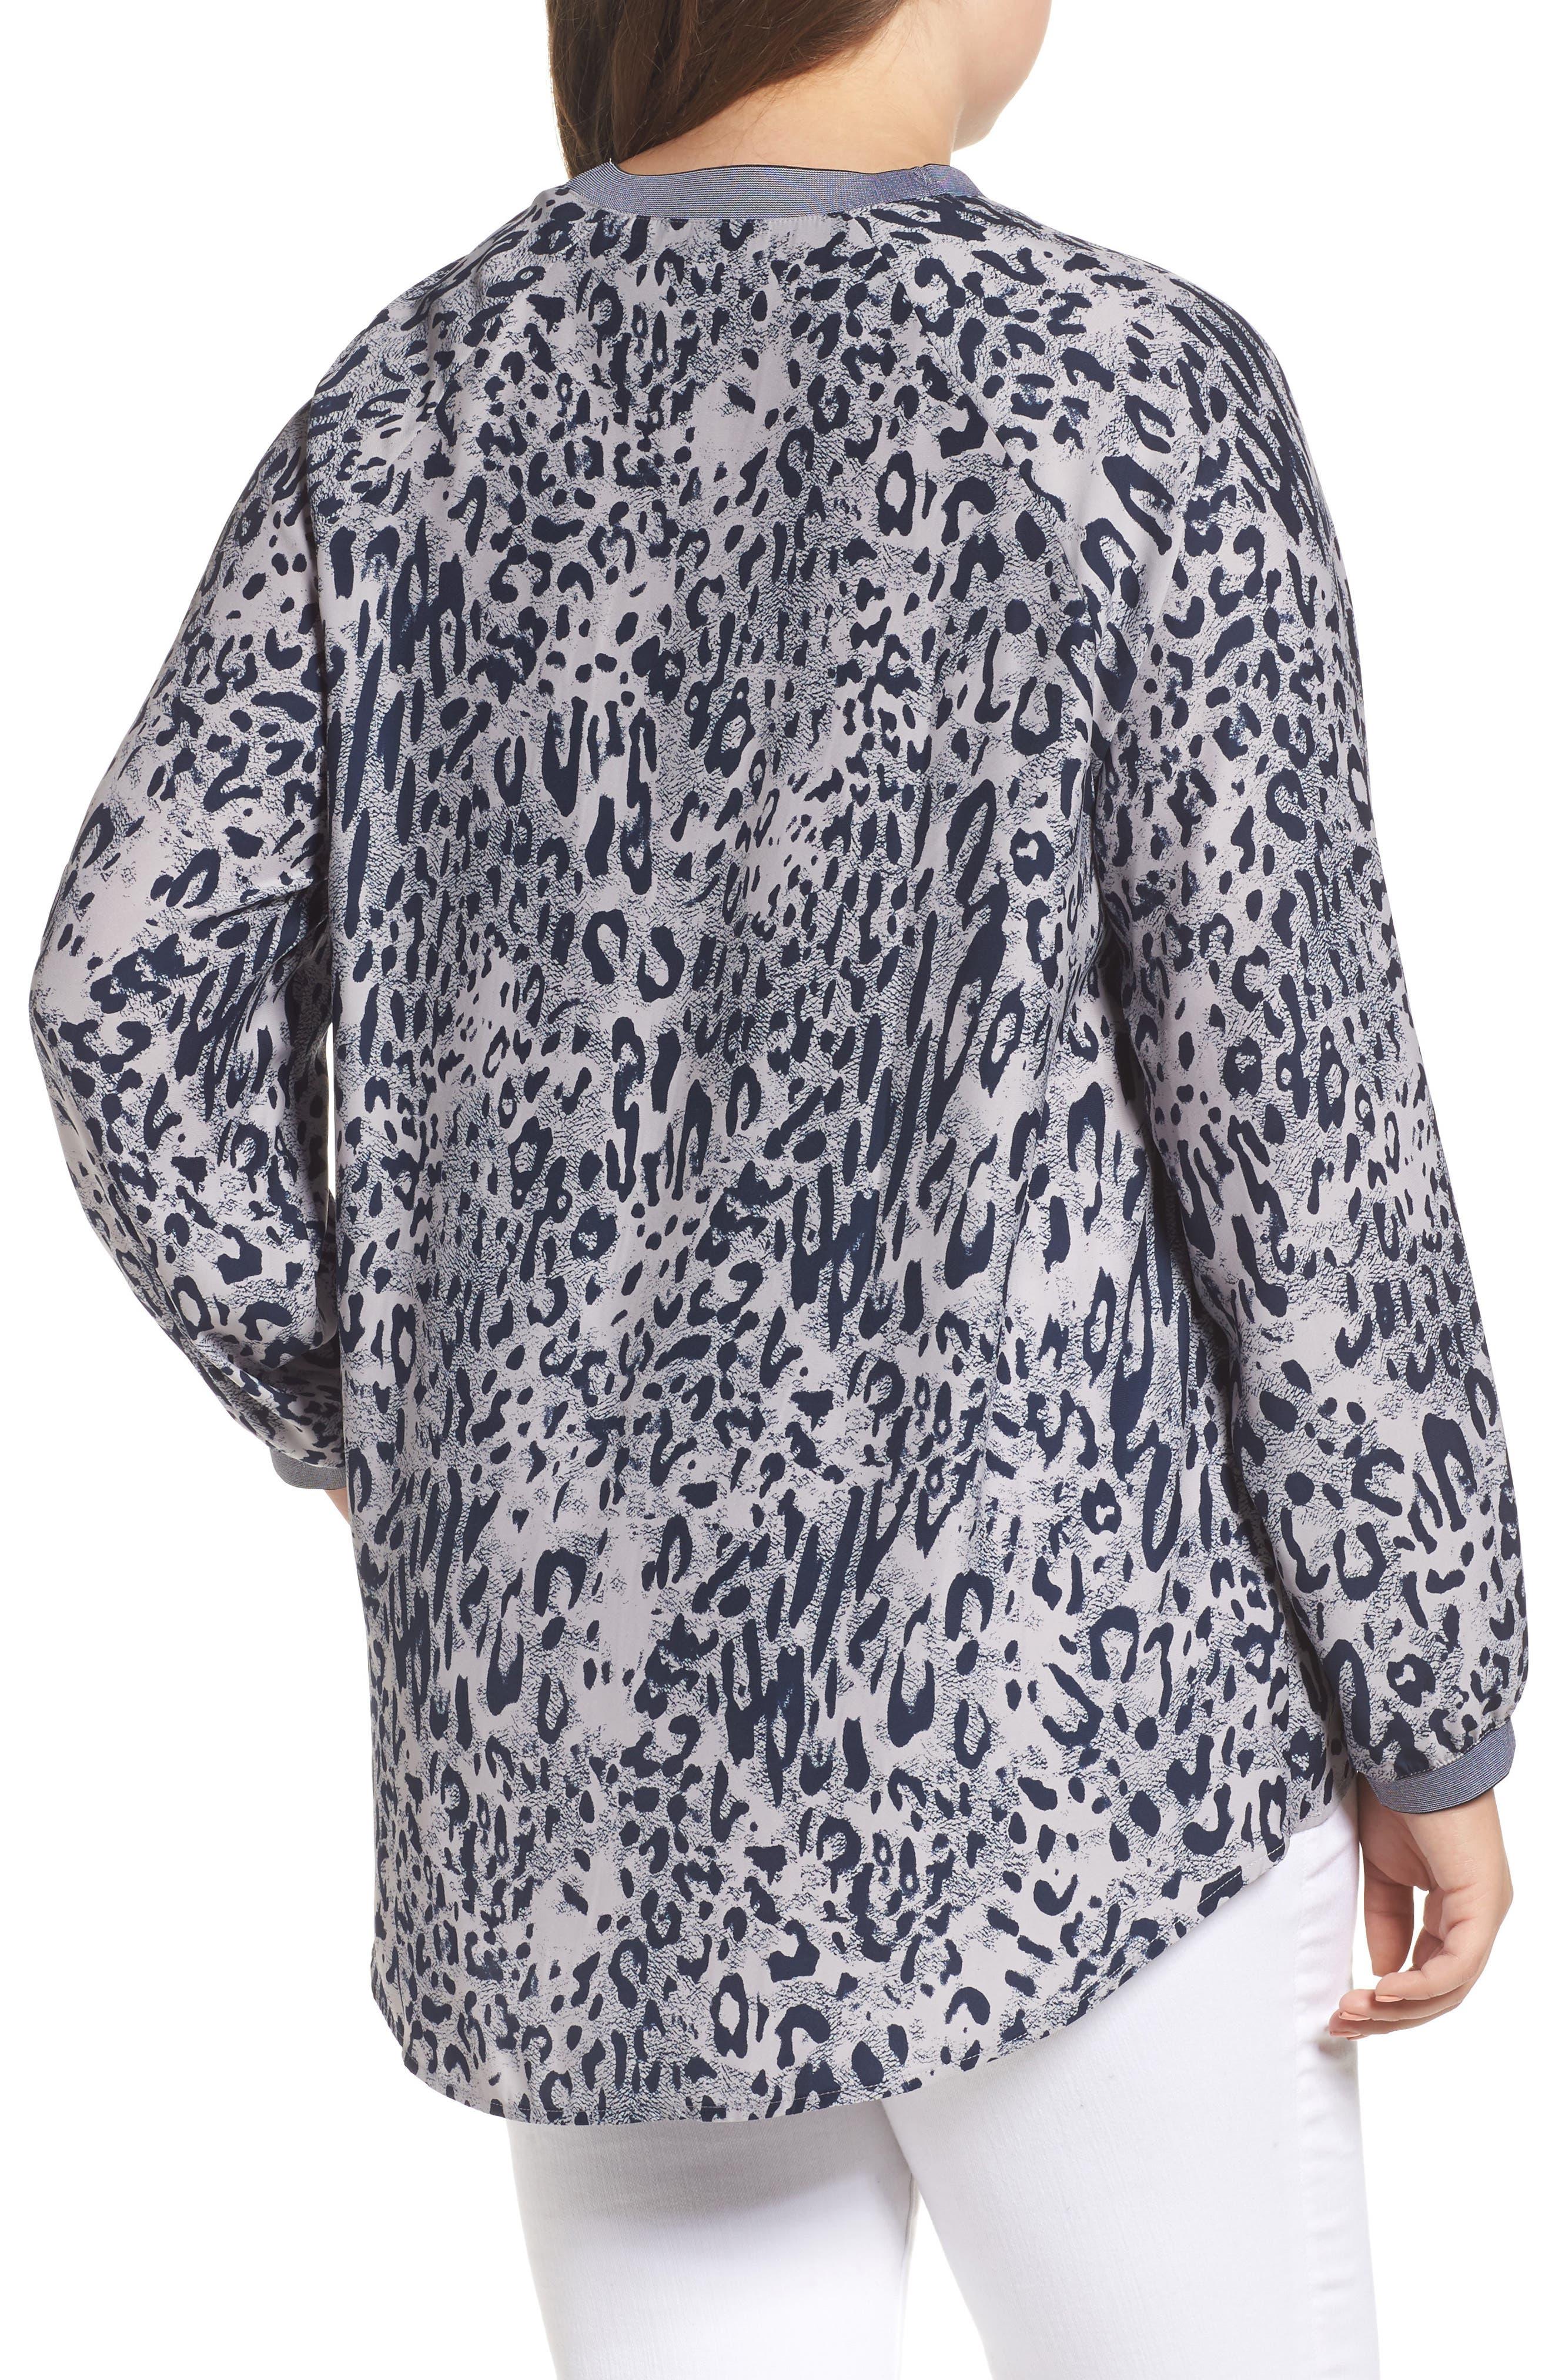 Leopard Print Raglan Blouse,                             Alternate thumbnail 2, color,                             Abstract Leopard/ Blue Trim